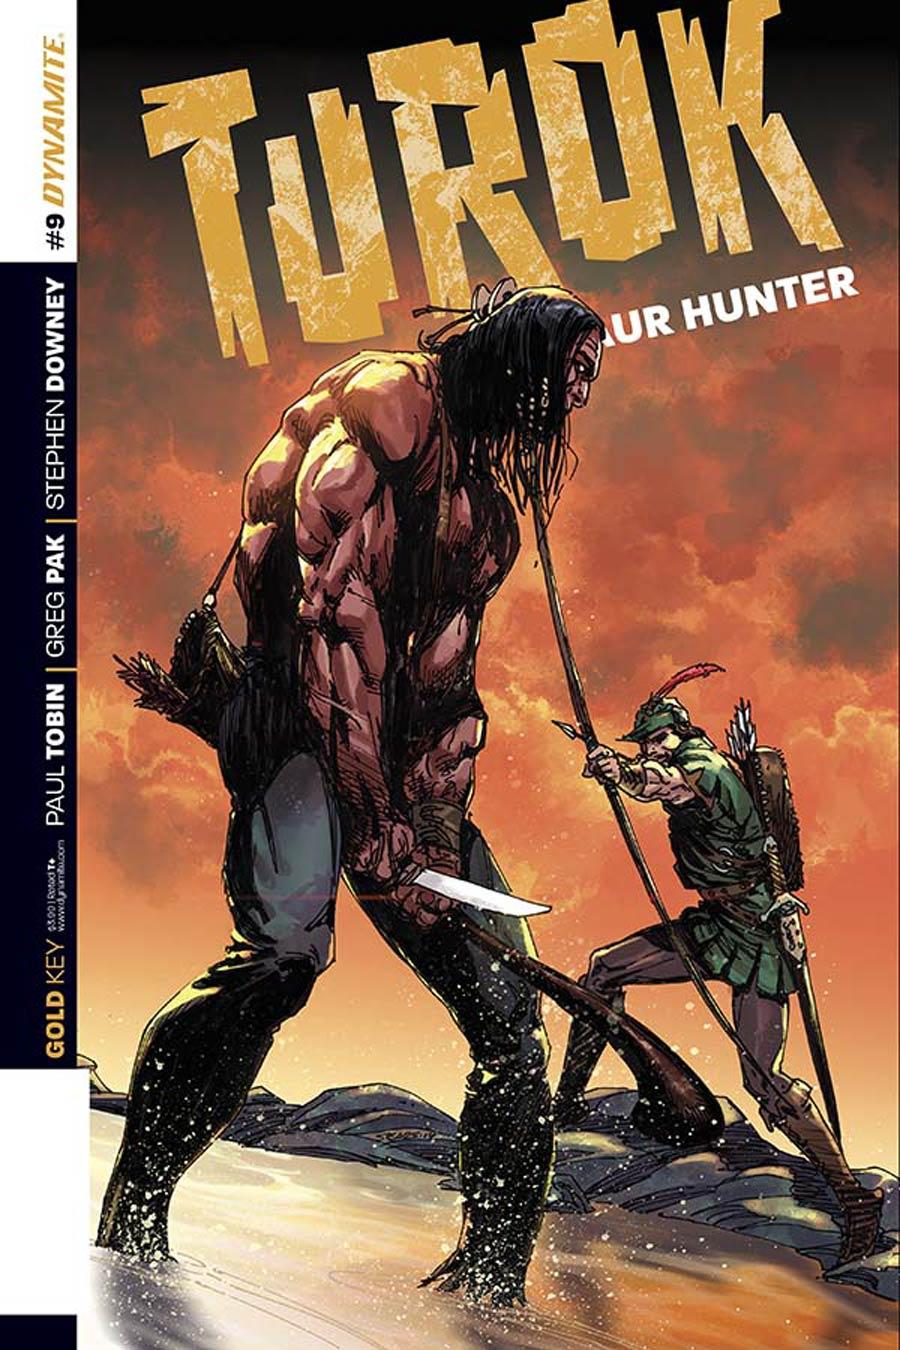 Turok Dinosaur Hunter Vol 2 #9 Cover A Regular Bart Sears Cover